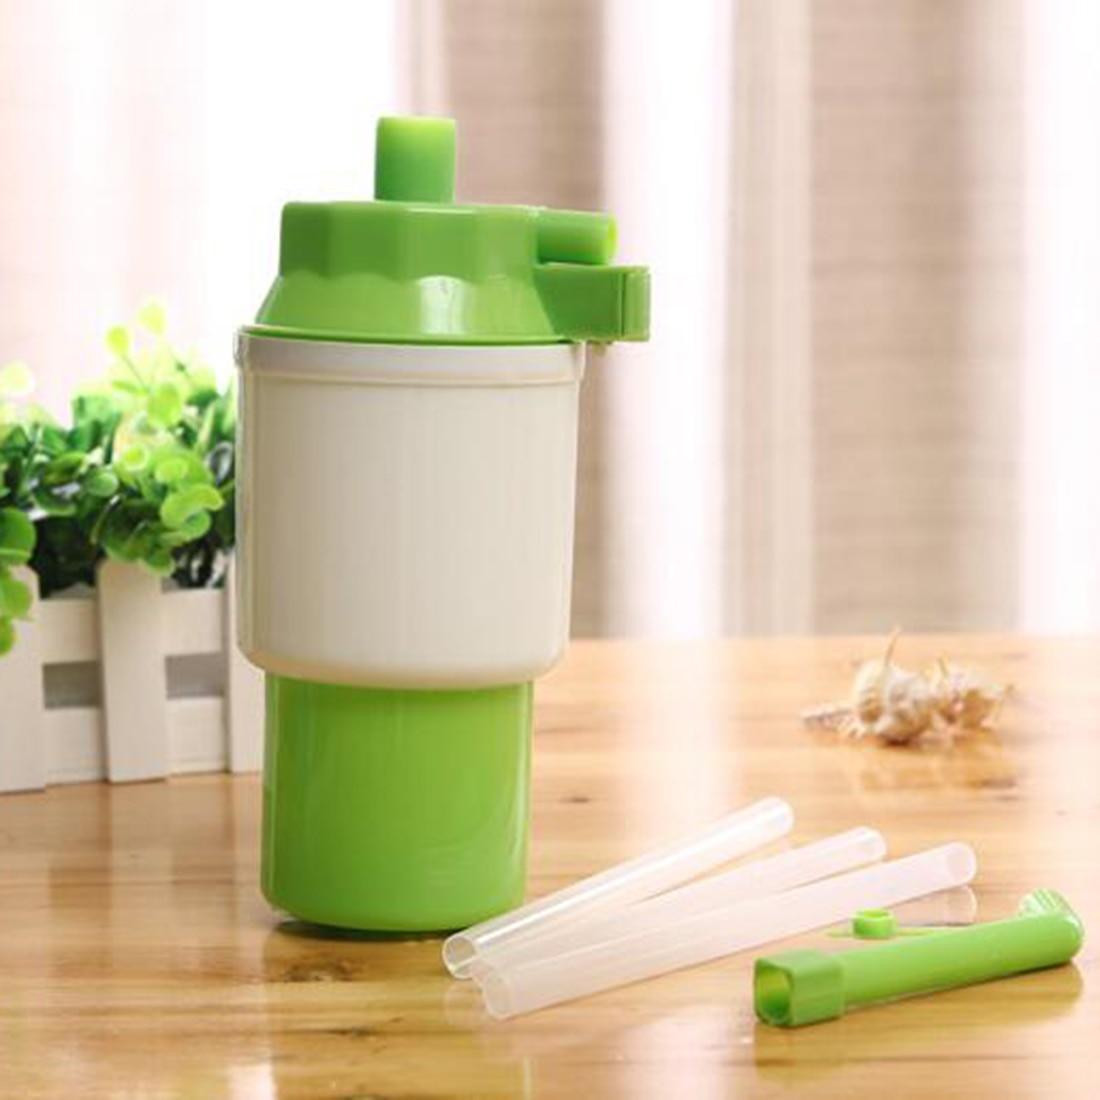 Best Seller Random Color Household Manual Water Bottle/Jug Hand Pump Hand Press Dispenser 2